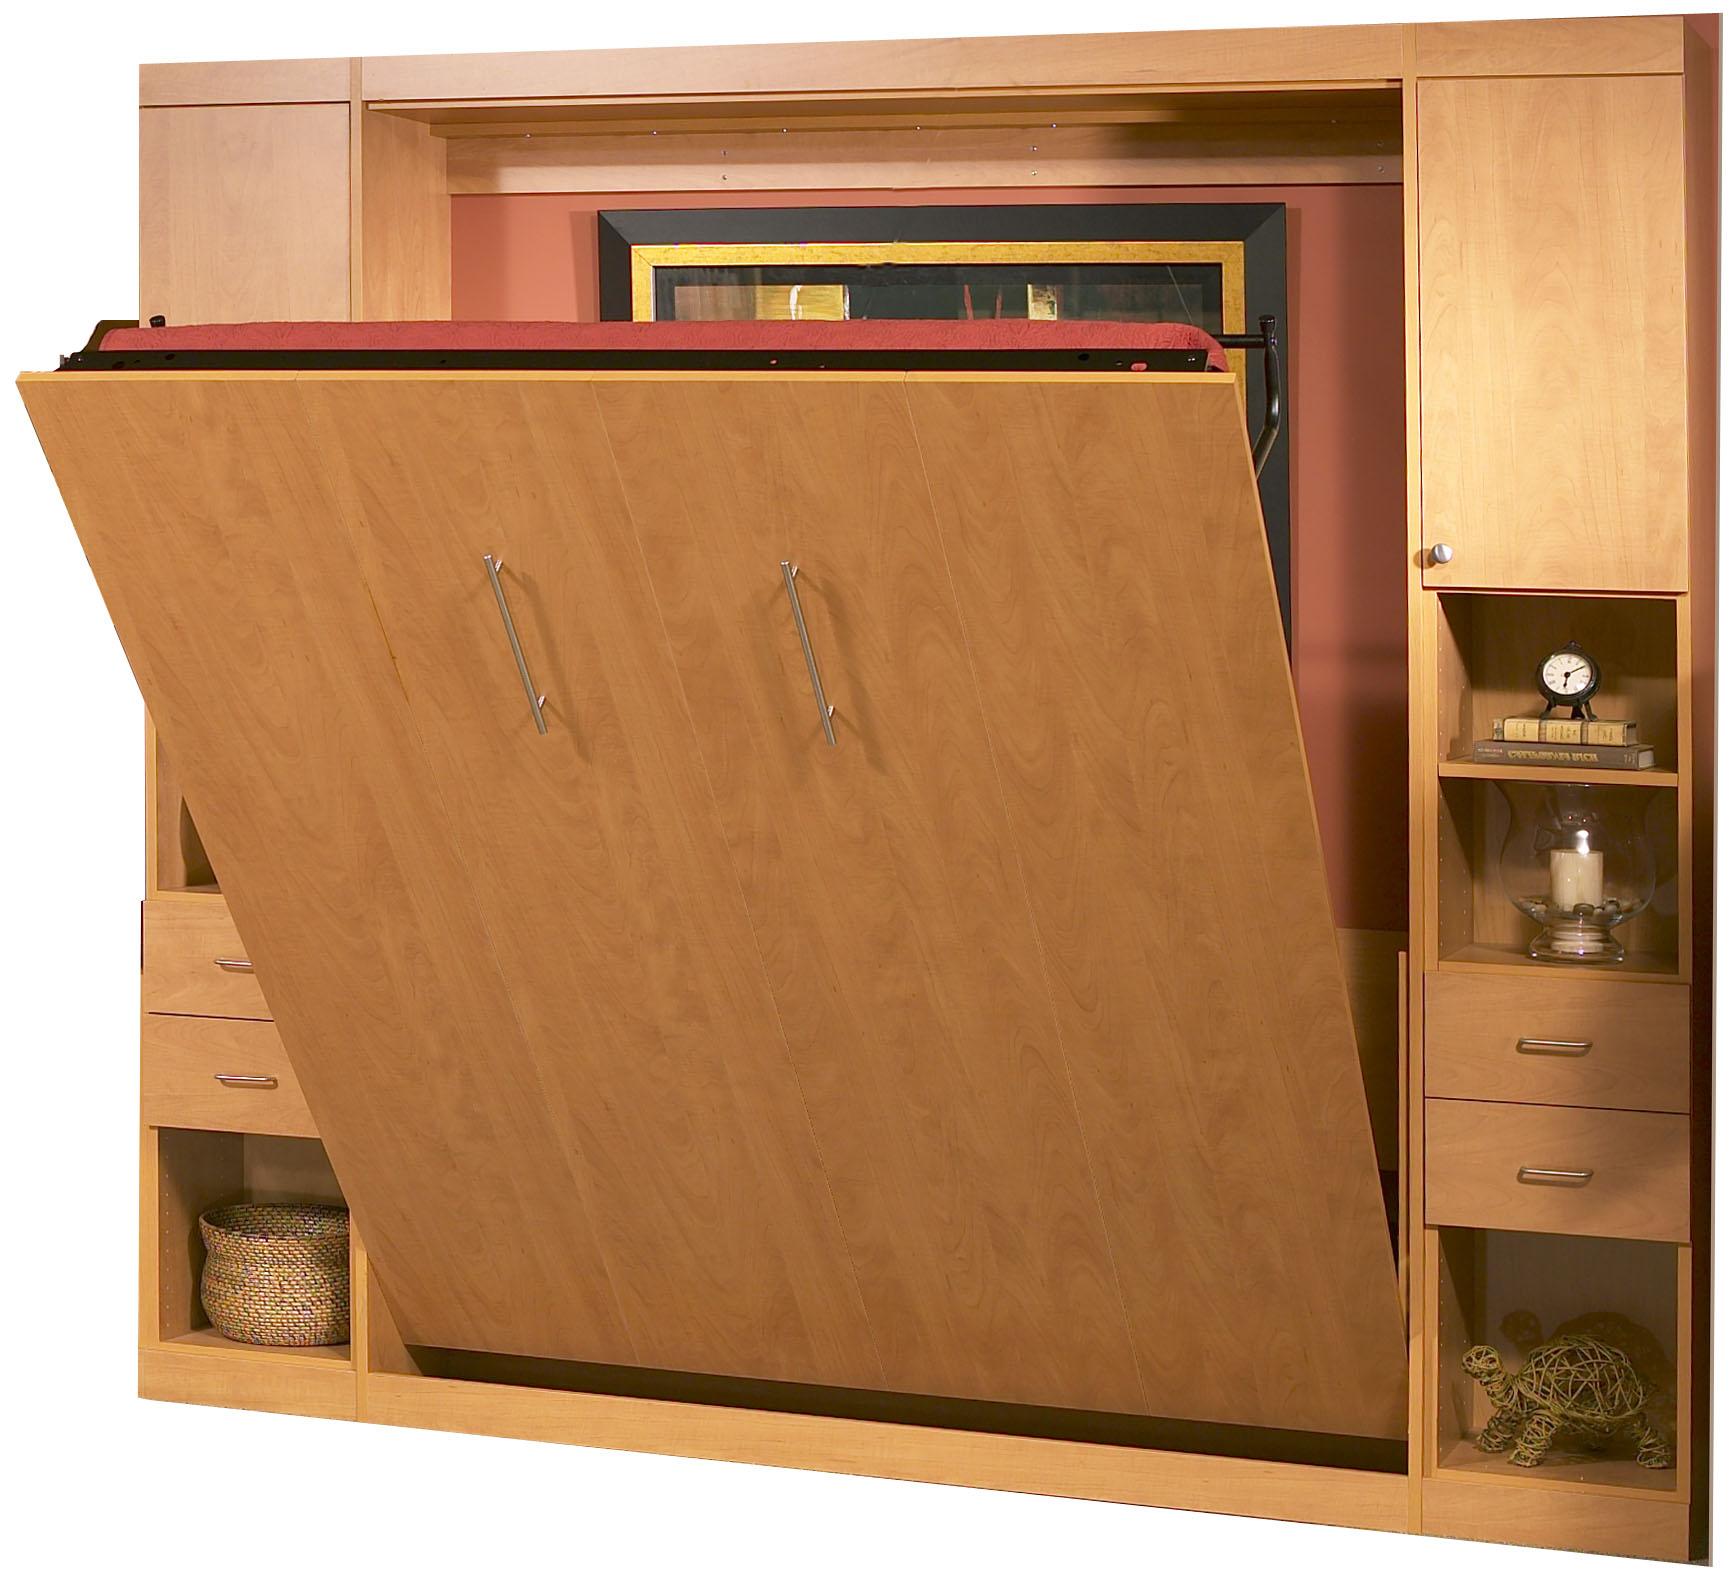 panel bed dallas